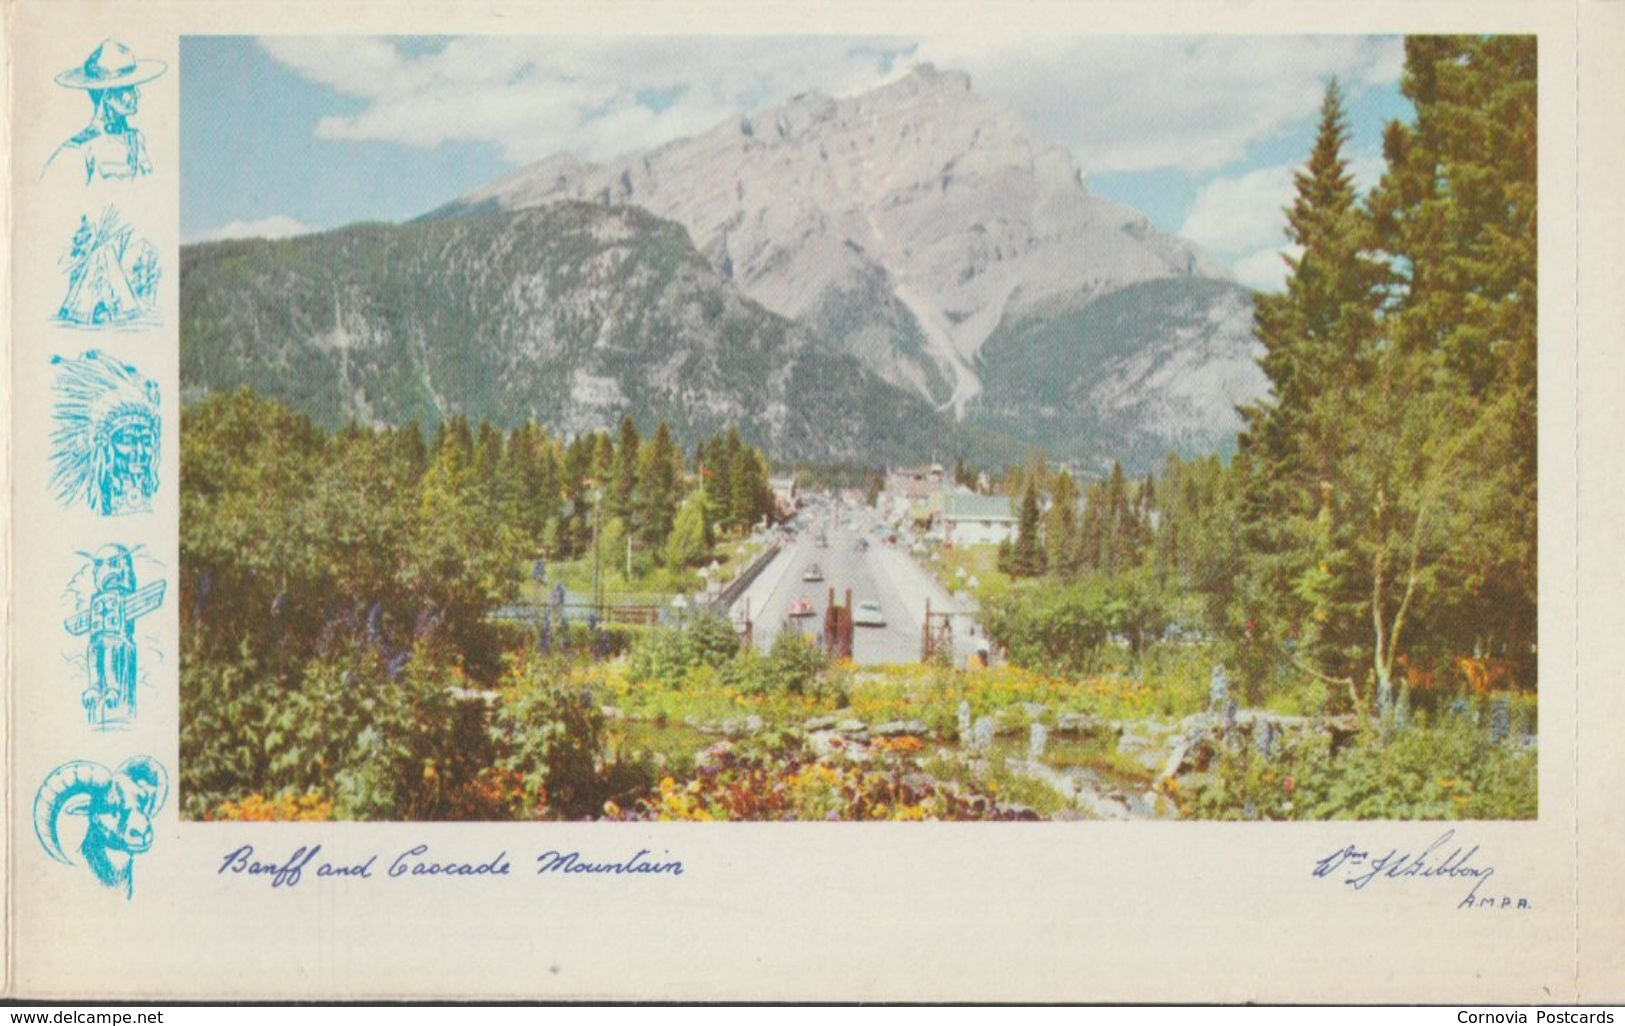 Greetings From The Canadian Rockies, Alberta, Canada, 1958 - Evergreen-Gibbons Lettersheet - Alberta